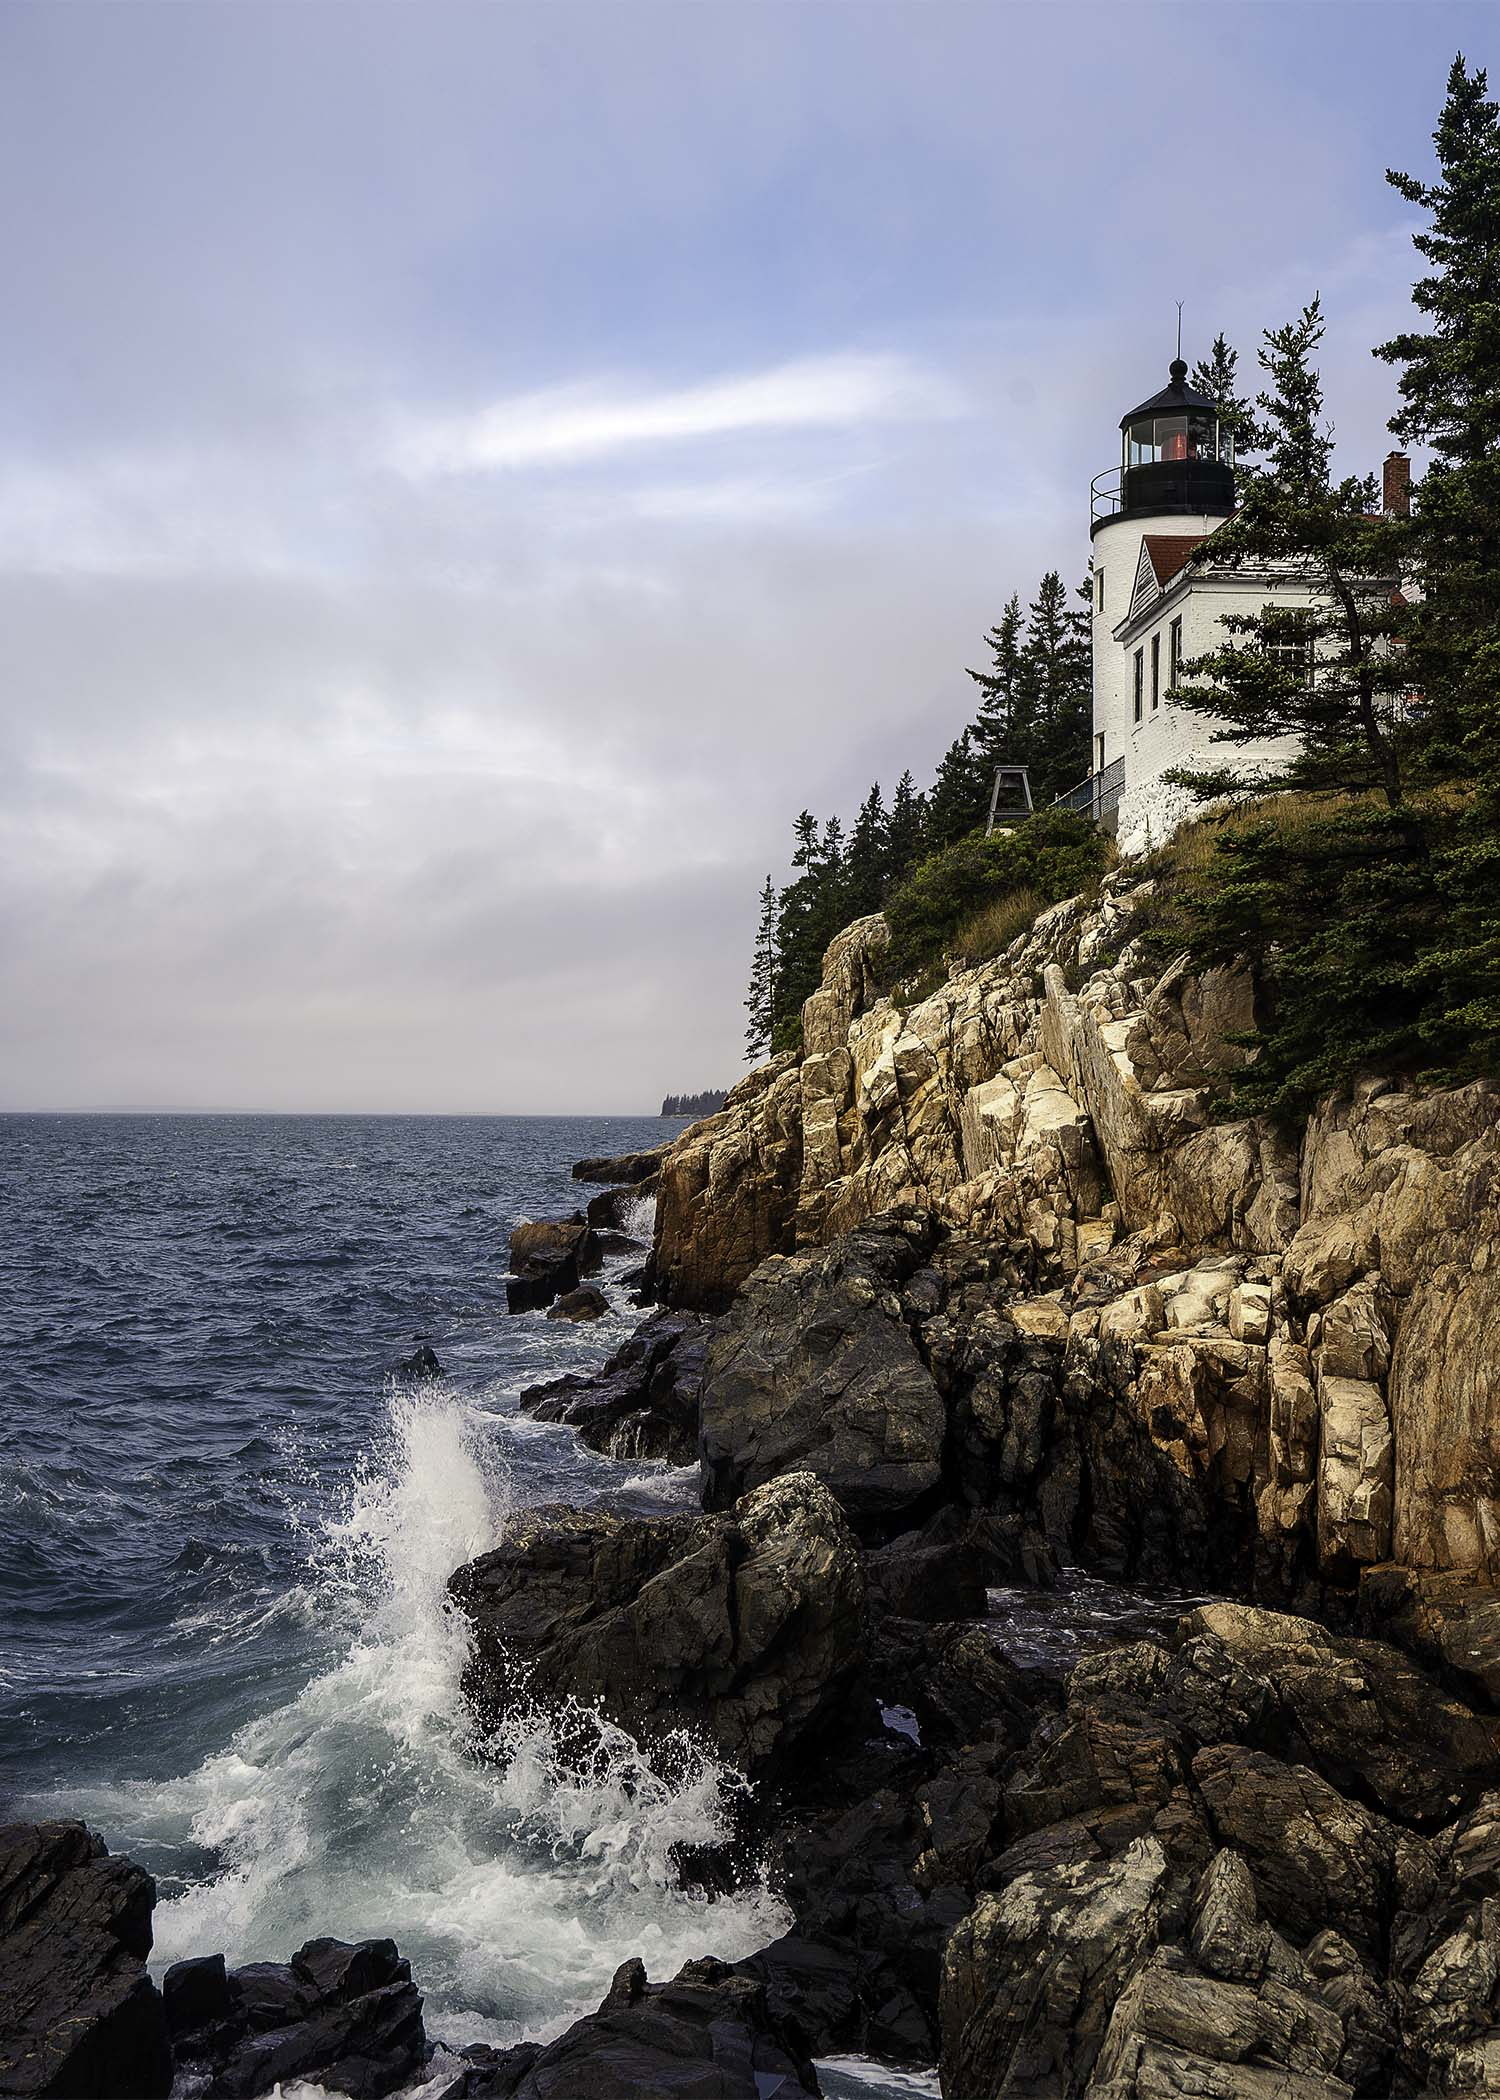 Bass Harbor lighthouse in Acadia National Park Maine